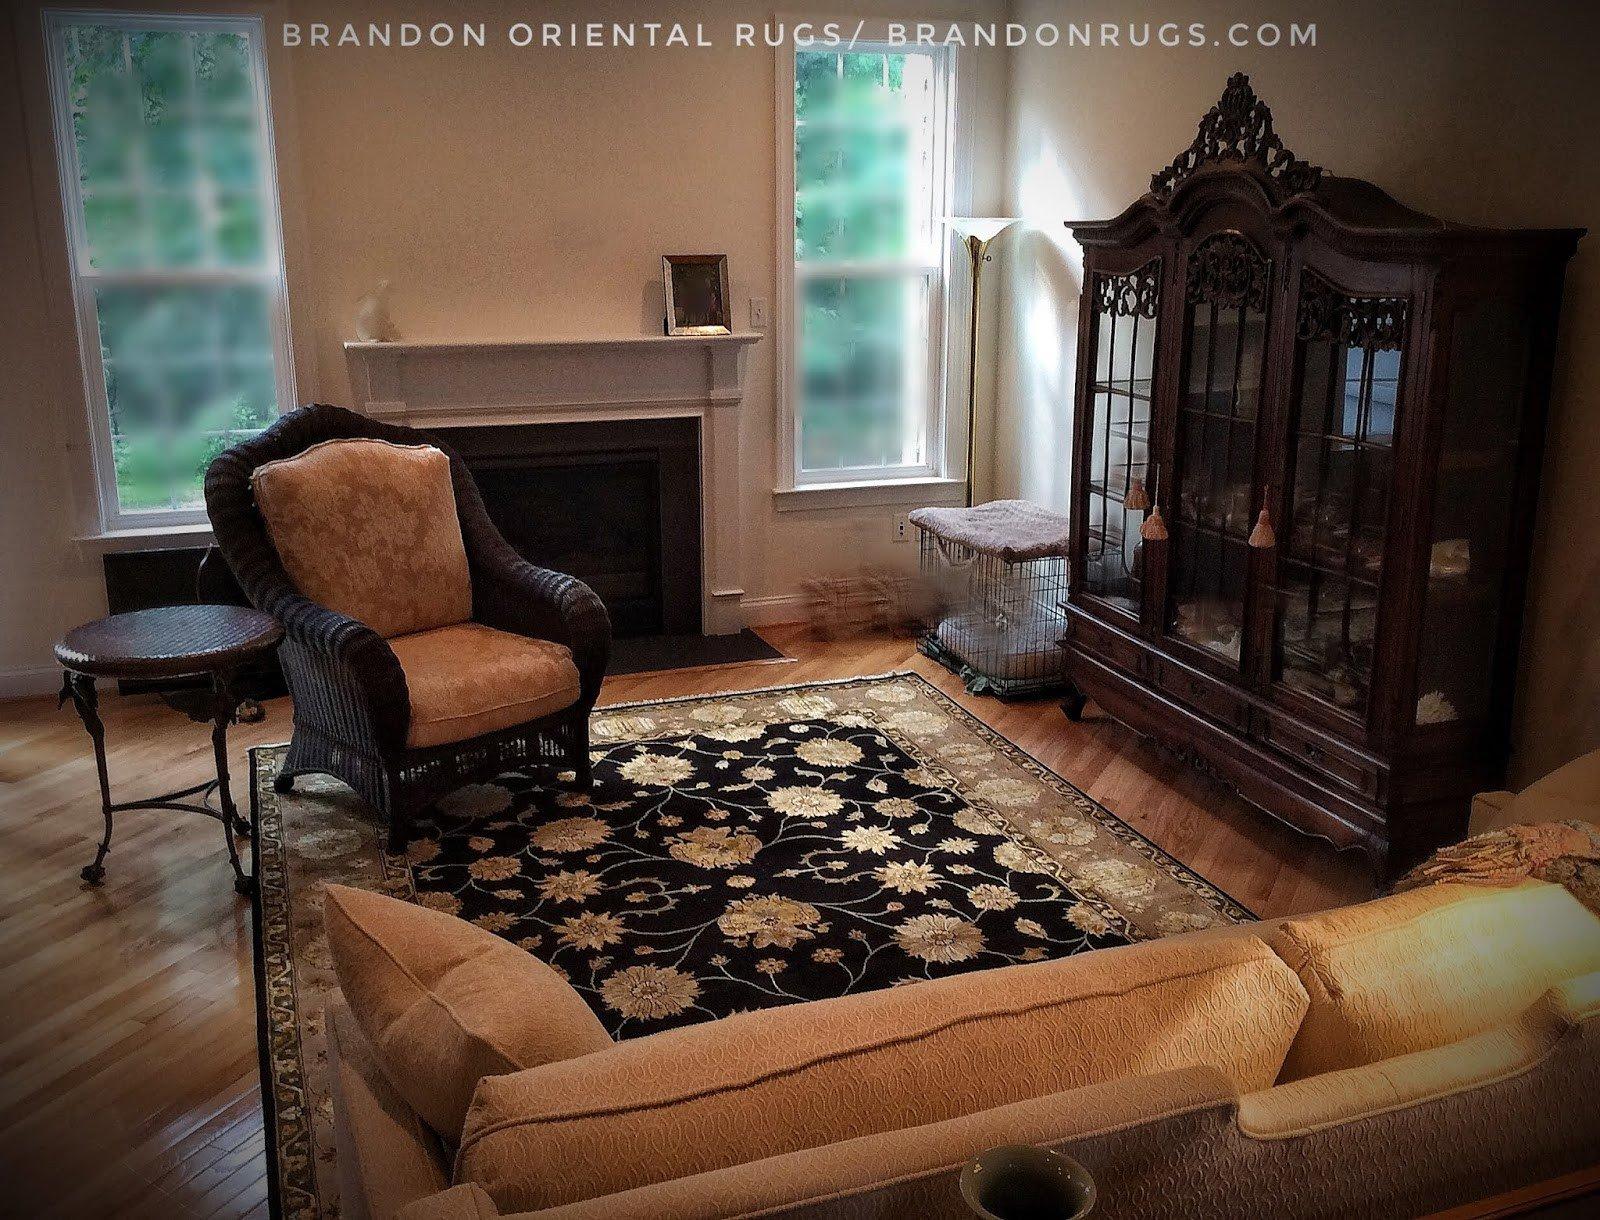 Comfortable Living Room Rugs Brandon oriental Rugs Bucks County Pa oriental Rug Store